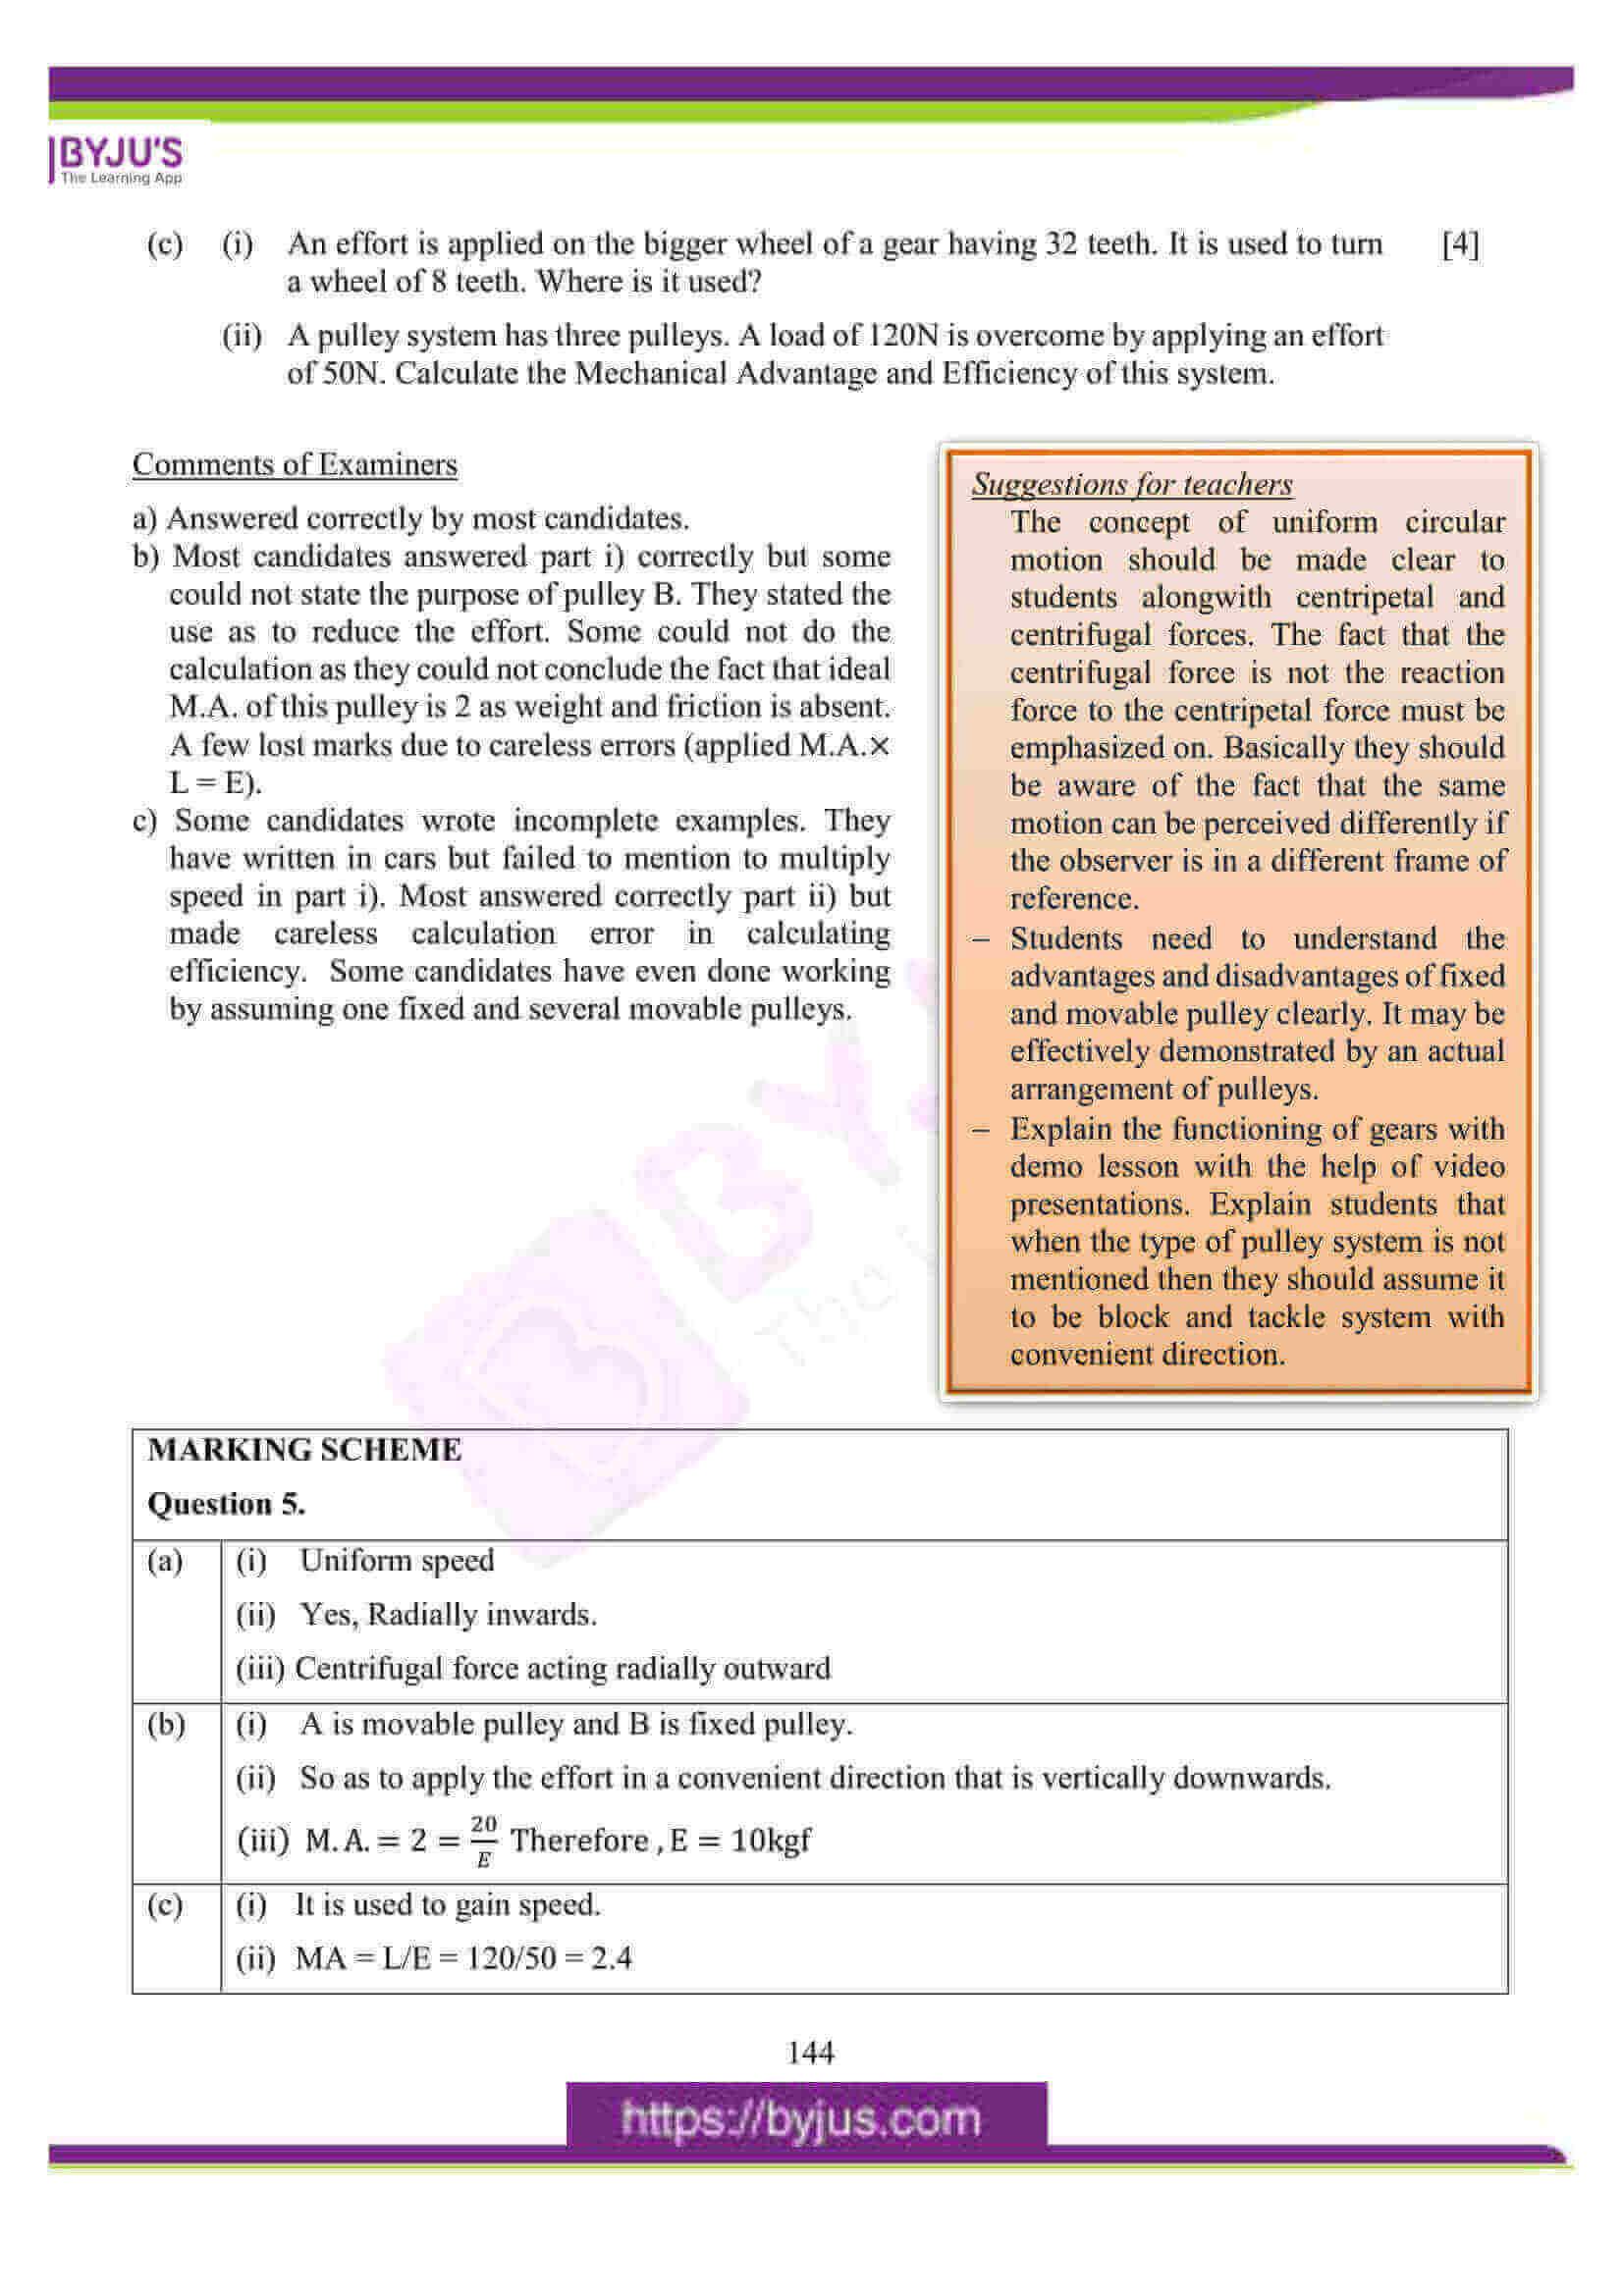 icse class 10 physics question paper solution 2016 09